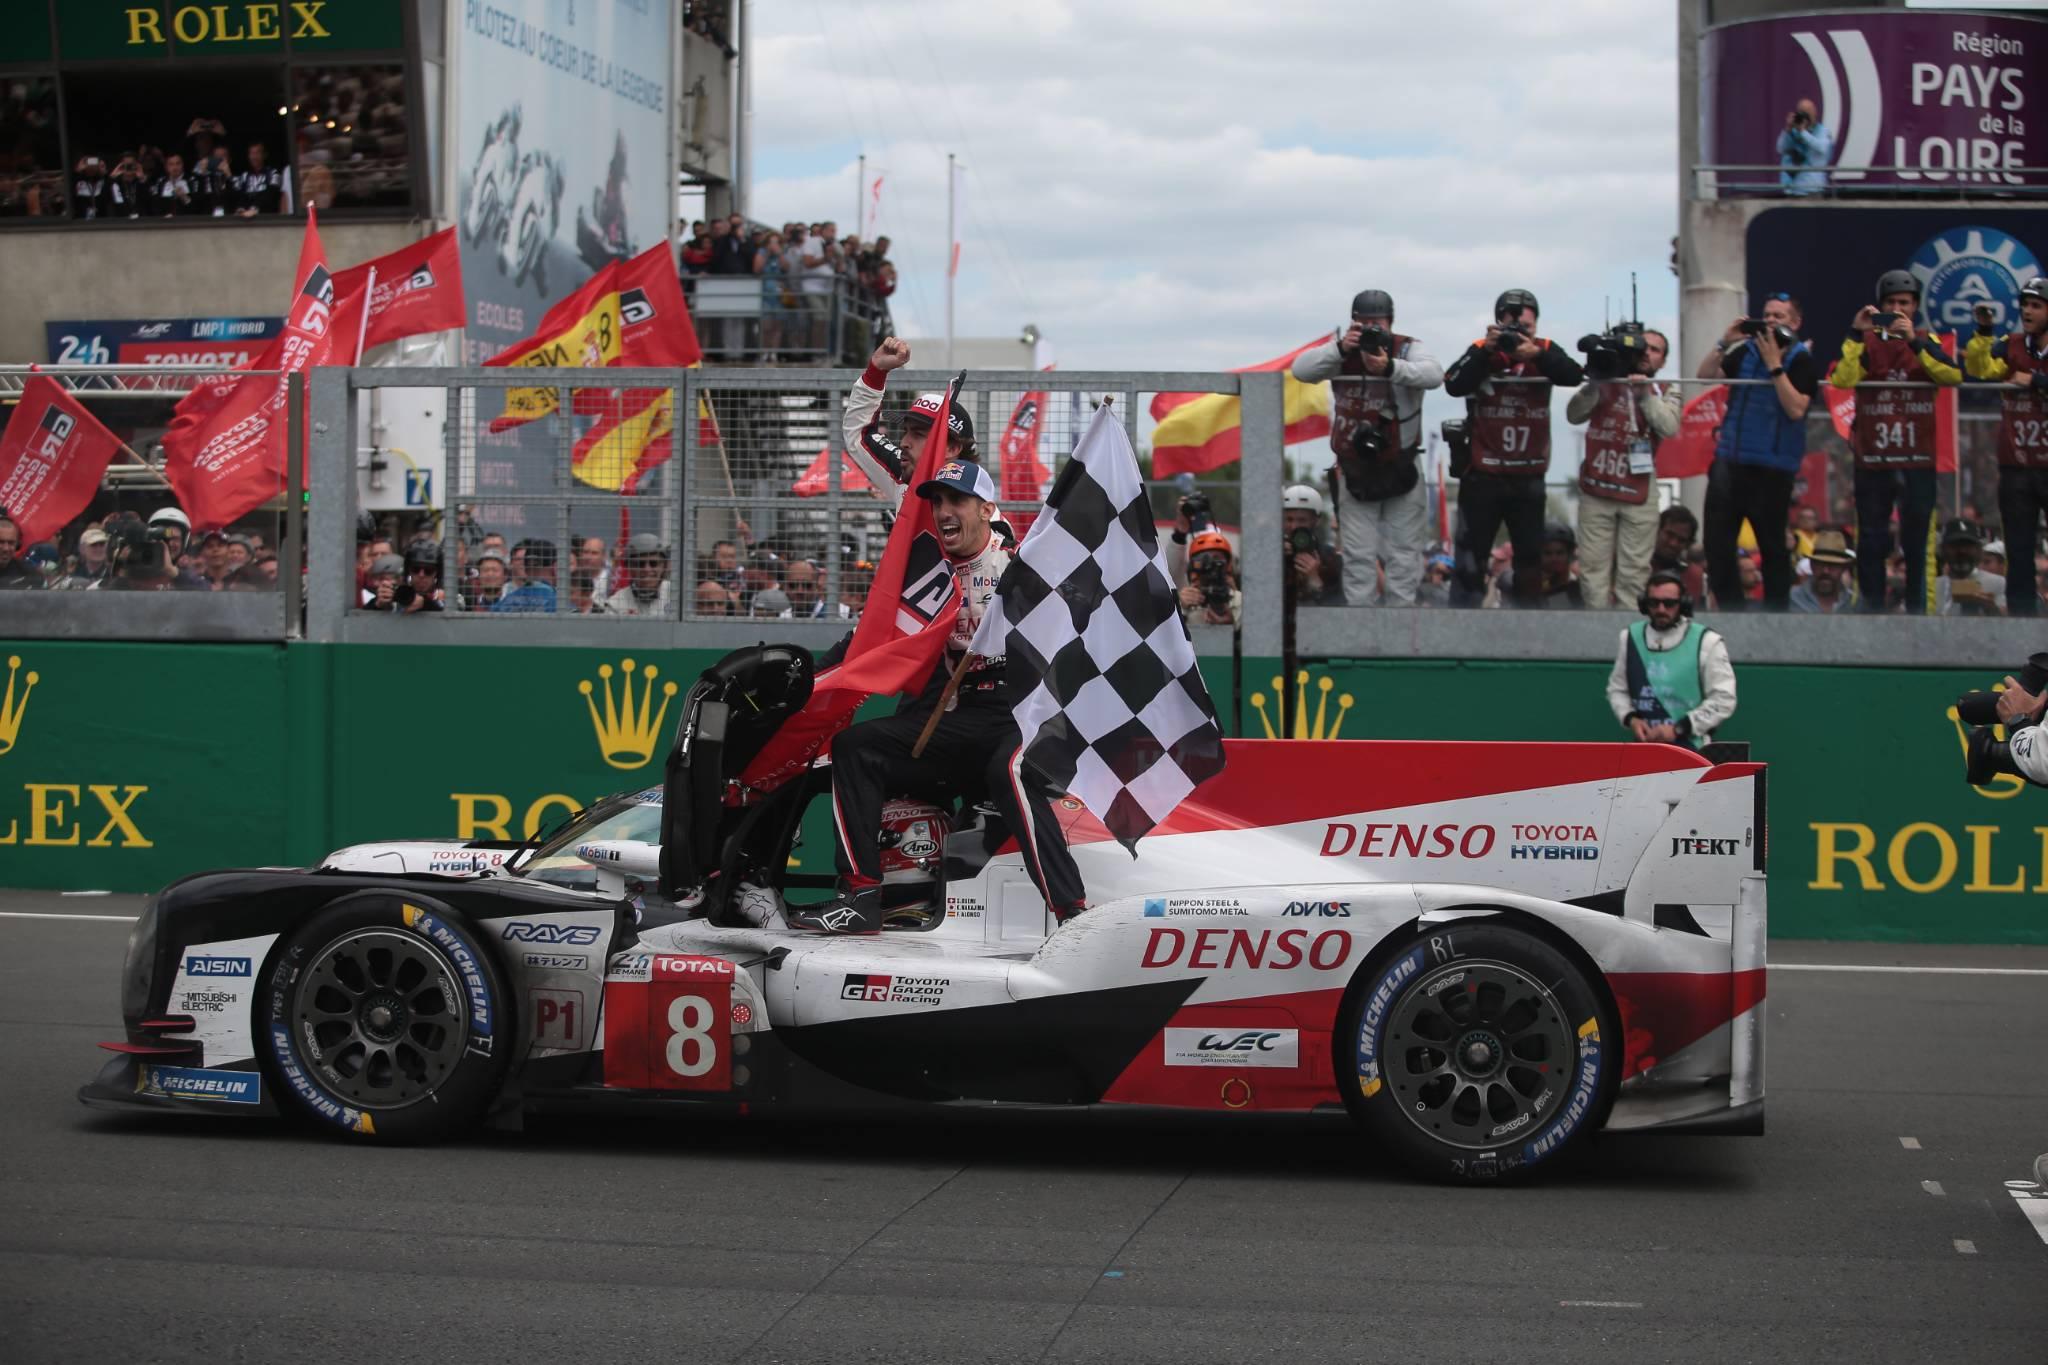 Winners of the 24 Hours of Le Mans 2018 Toyota Gazoo Racing - #8 Toyota TS050 Hybrid - LMP1 - Sébastien Buemi(CHE), Kazuki Nakajima(JPN), Fernando Alonso(ESP)